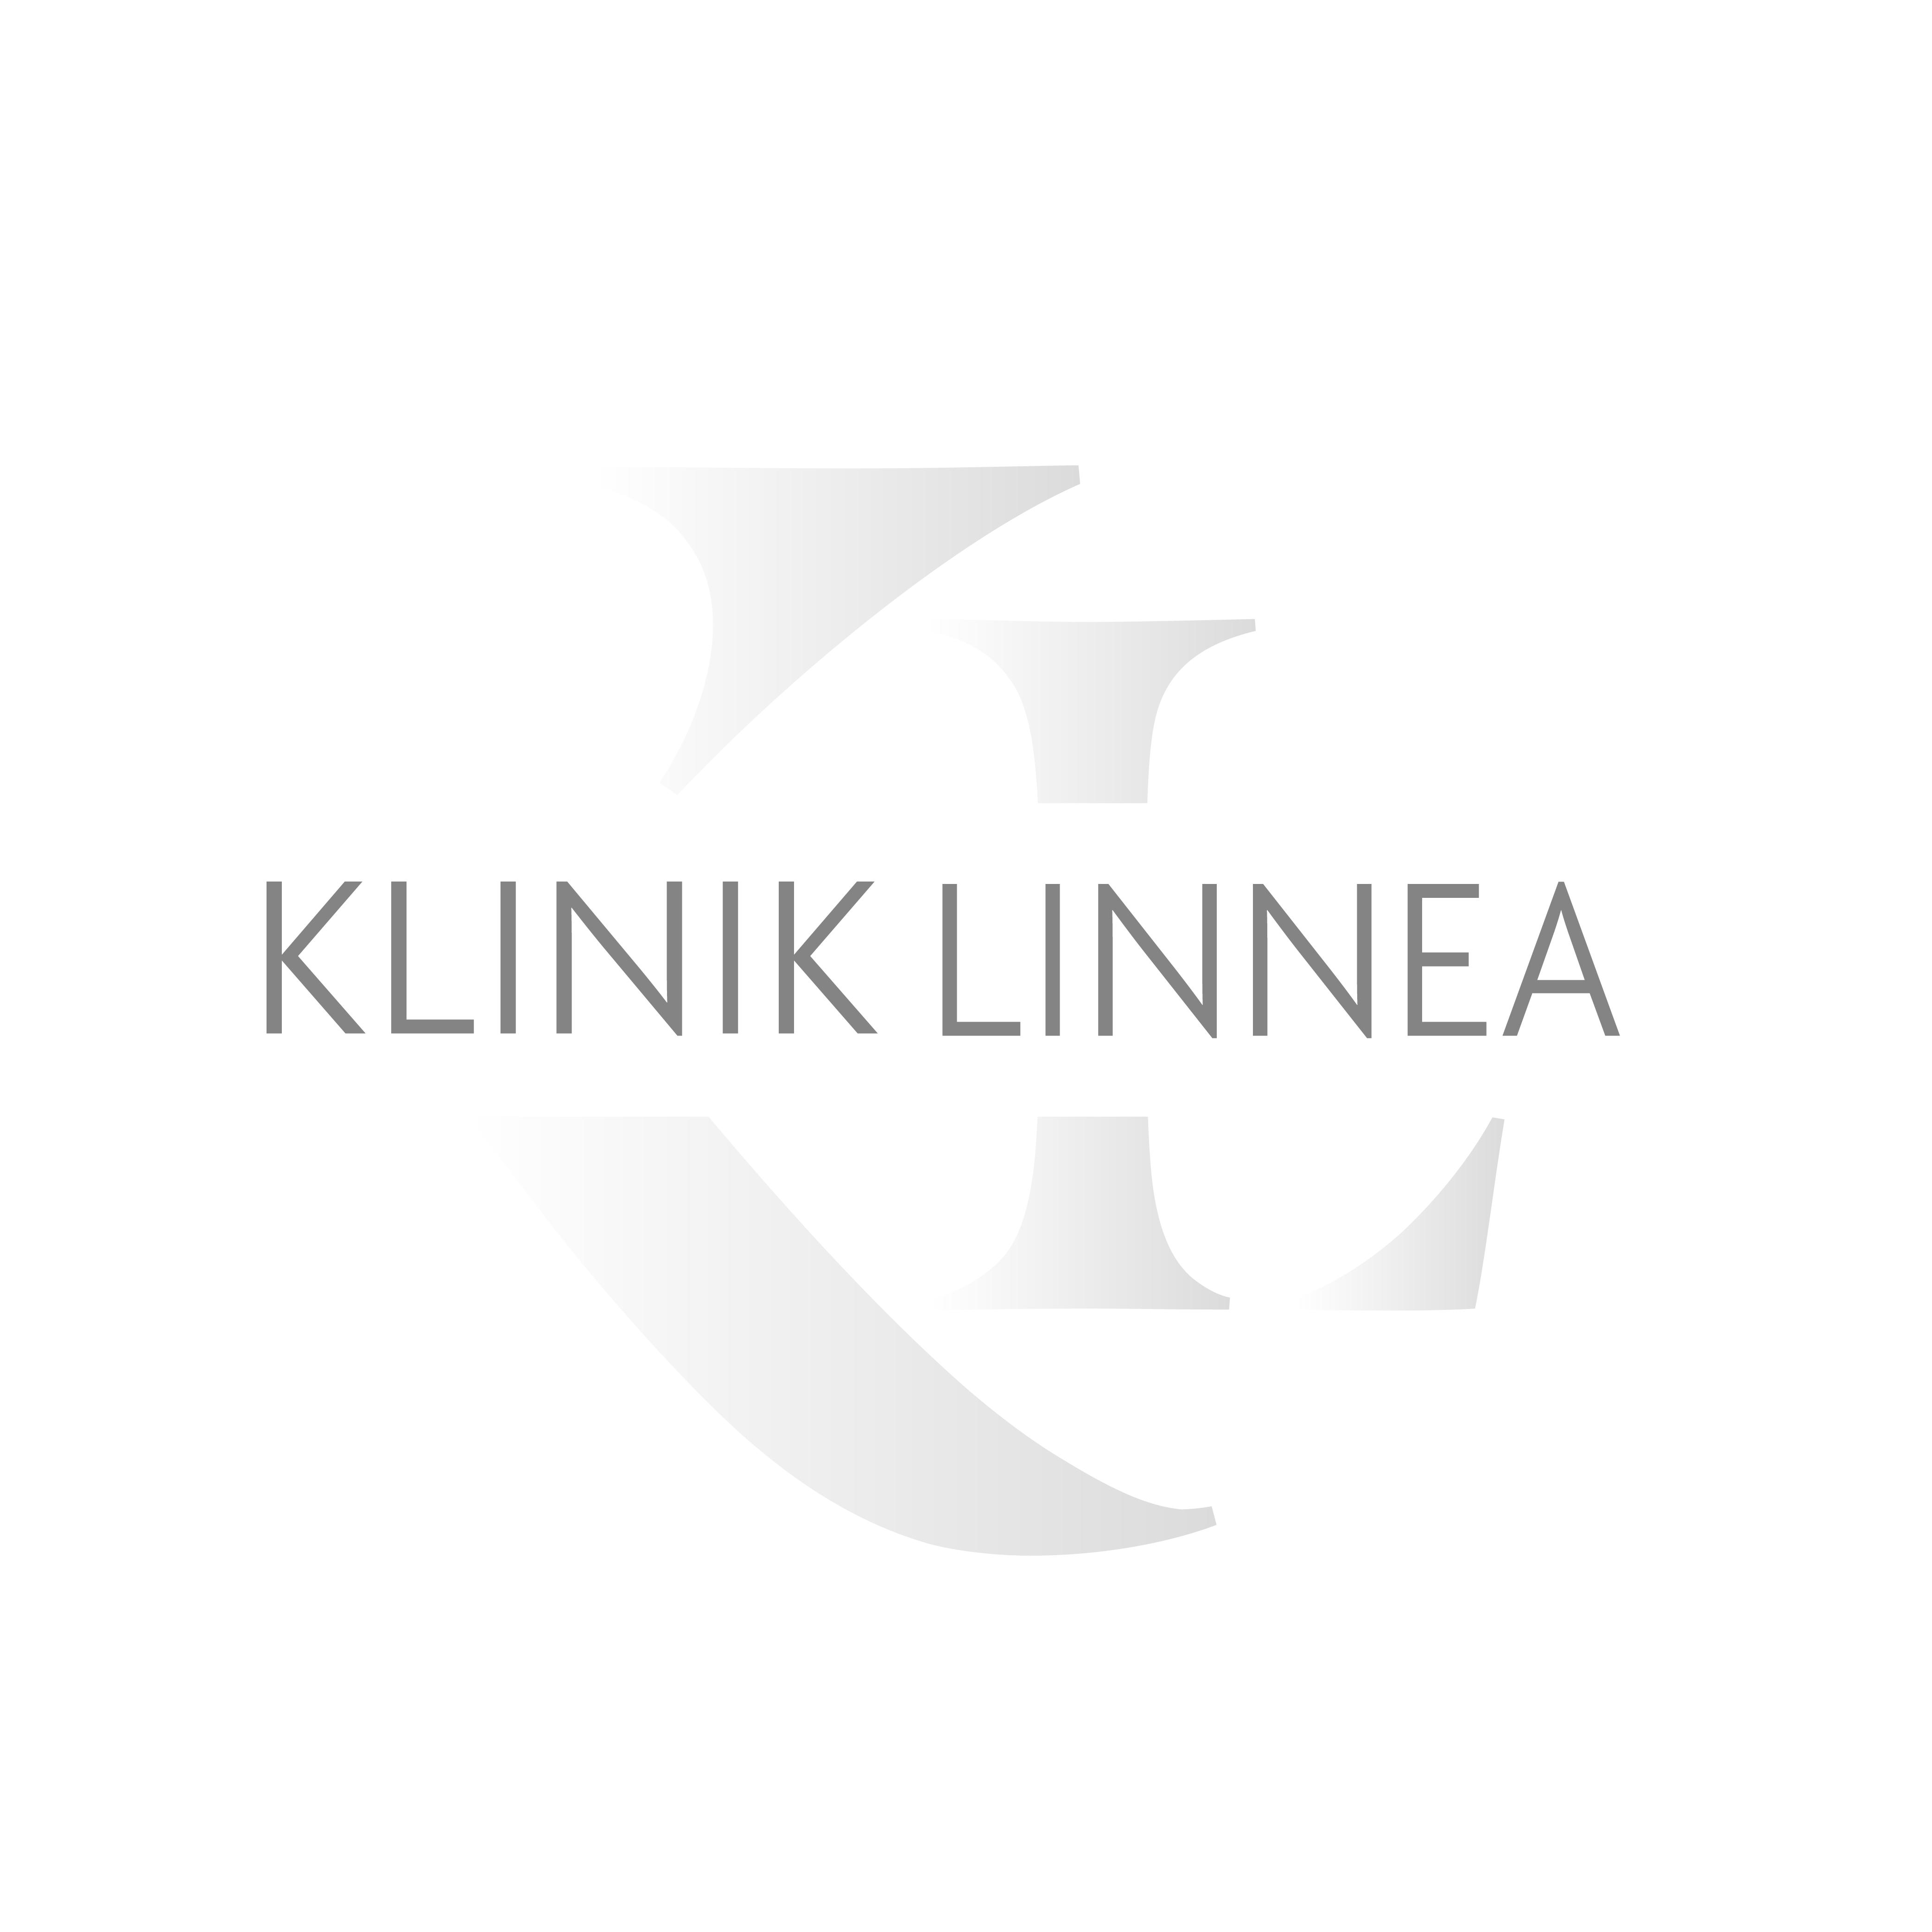 Klinik Linnea Oy logo